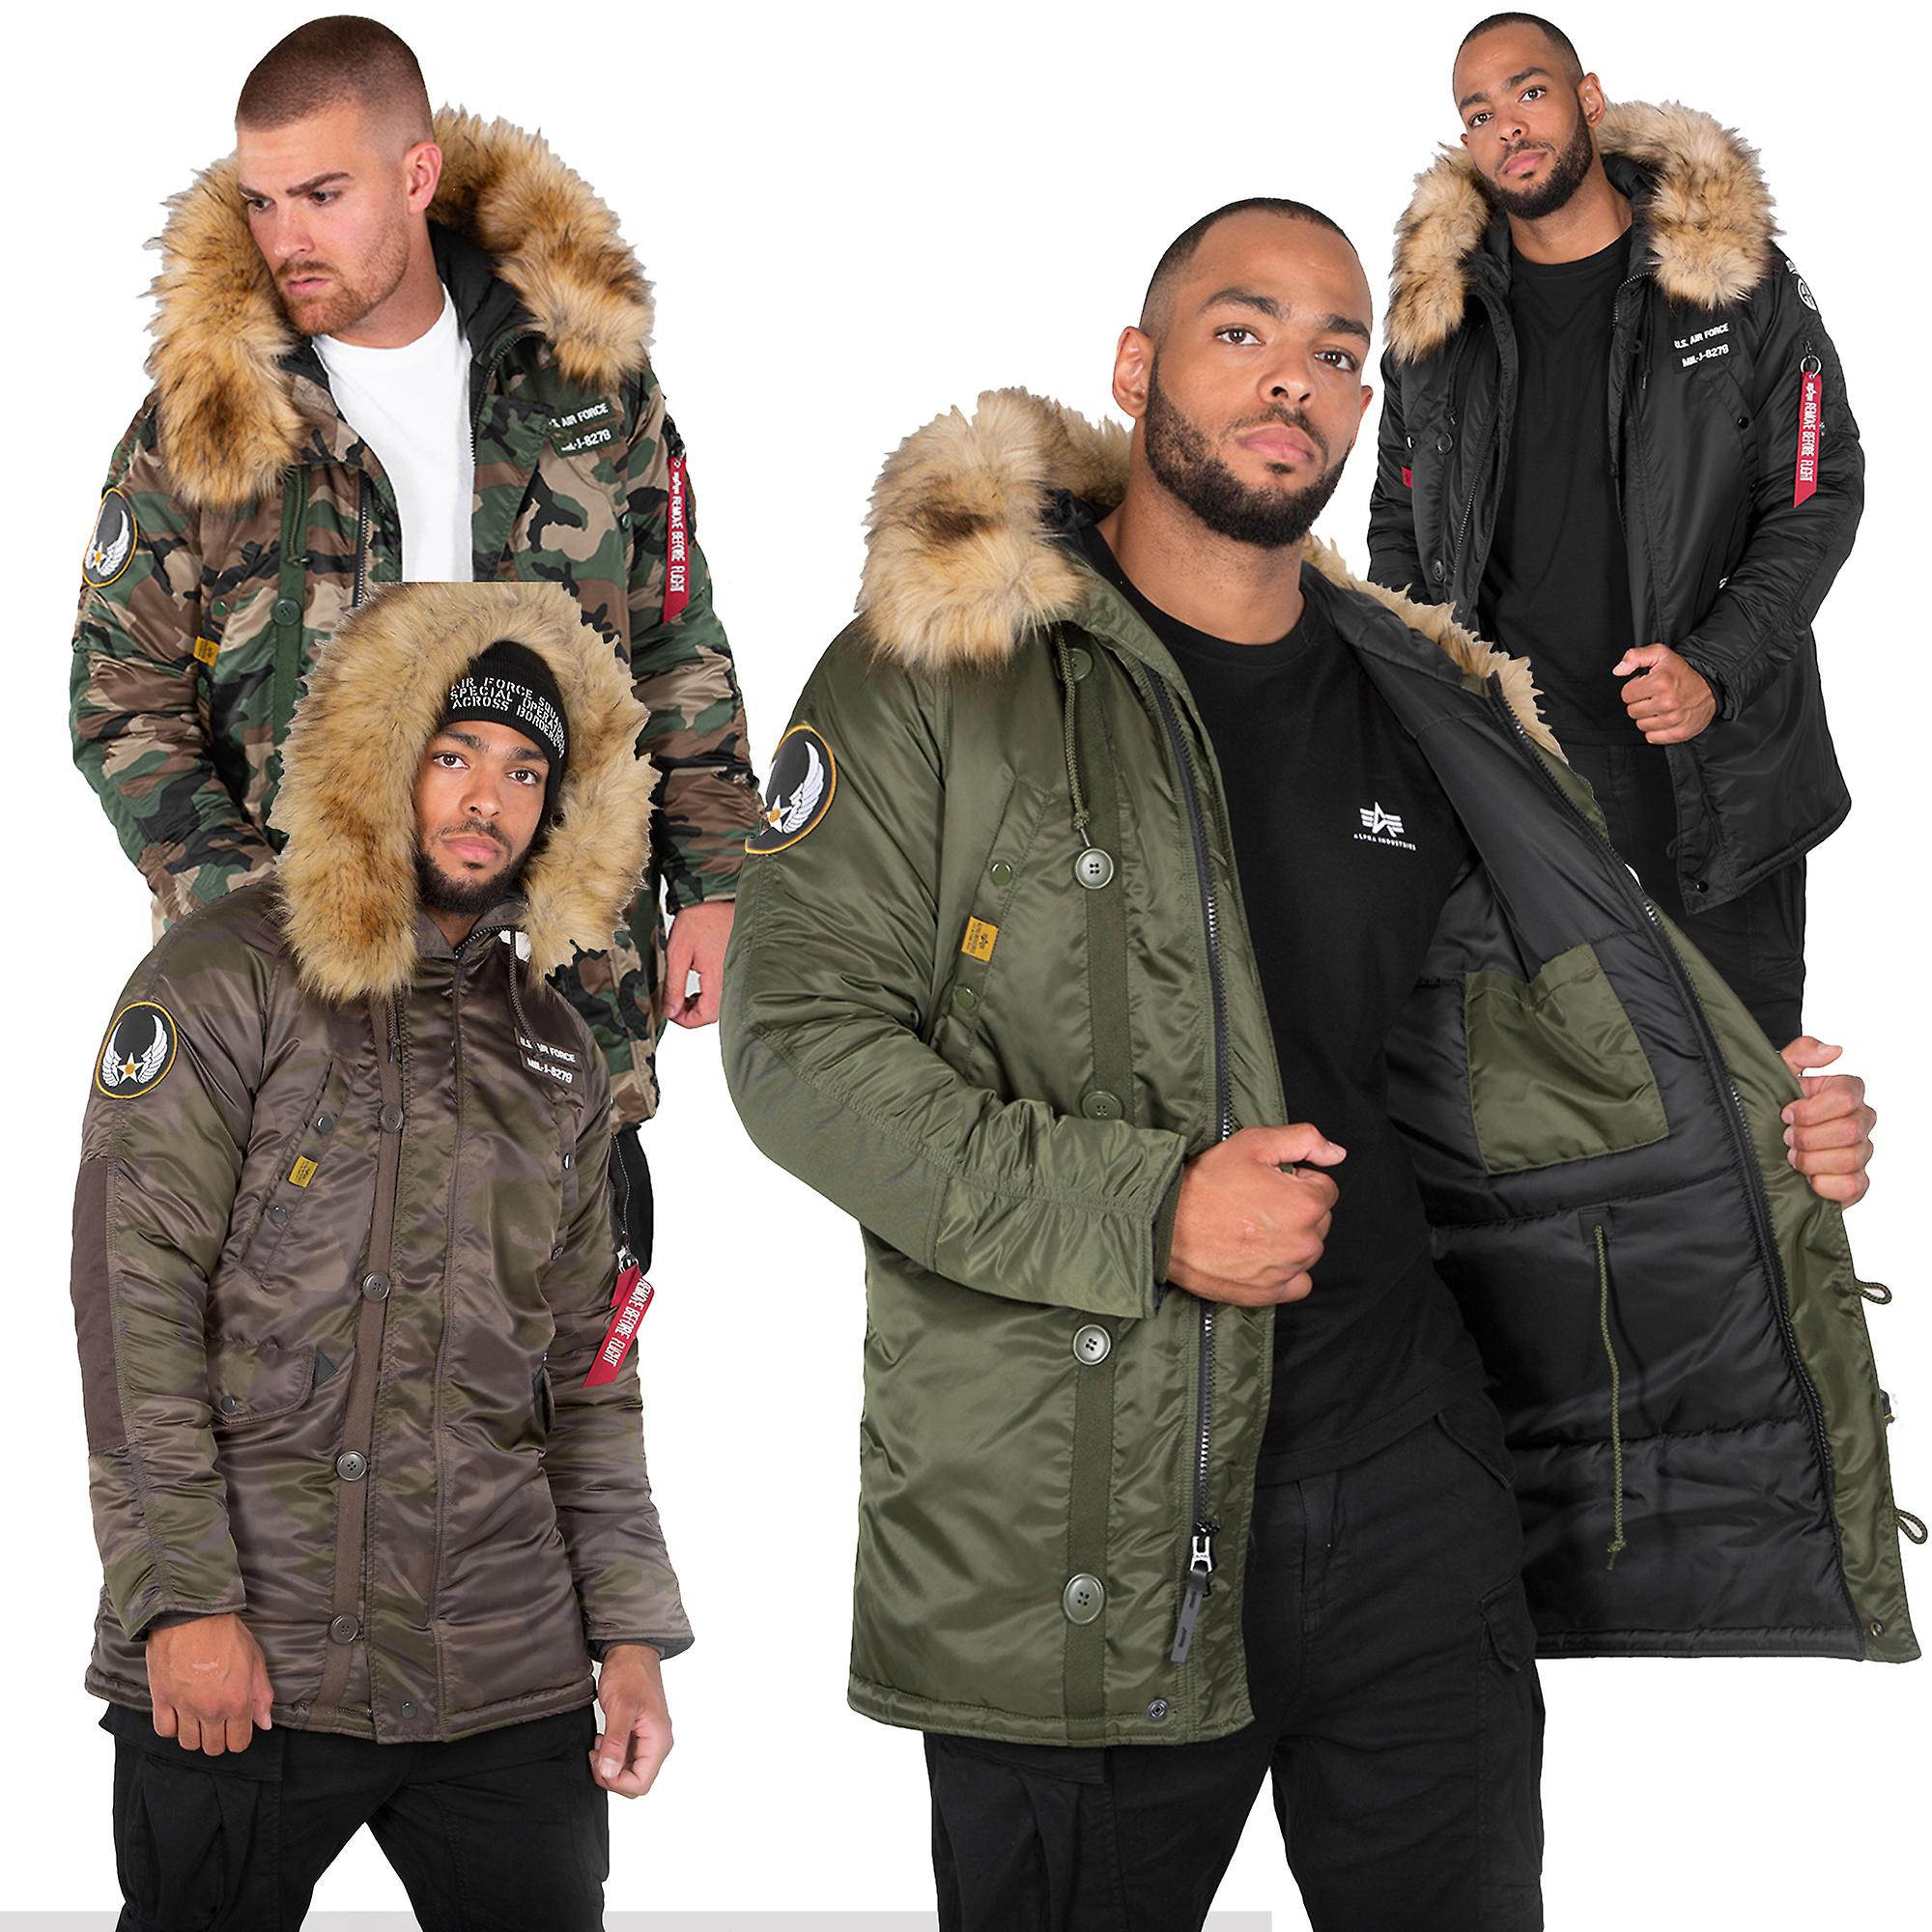 newest collection 48d2b 98cc8 Alpha industries men's winter jacket N3B airborne